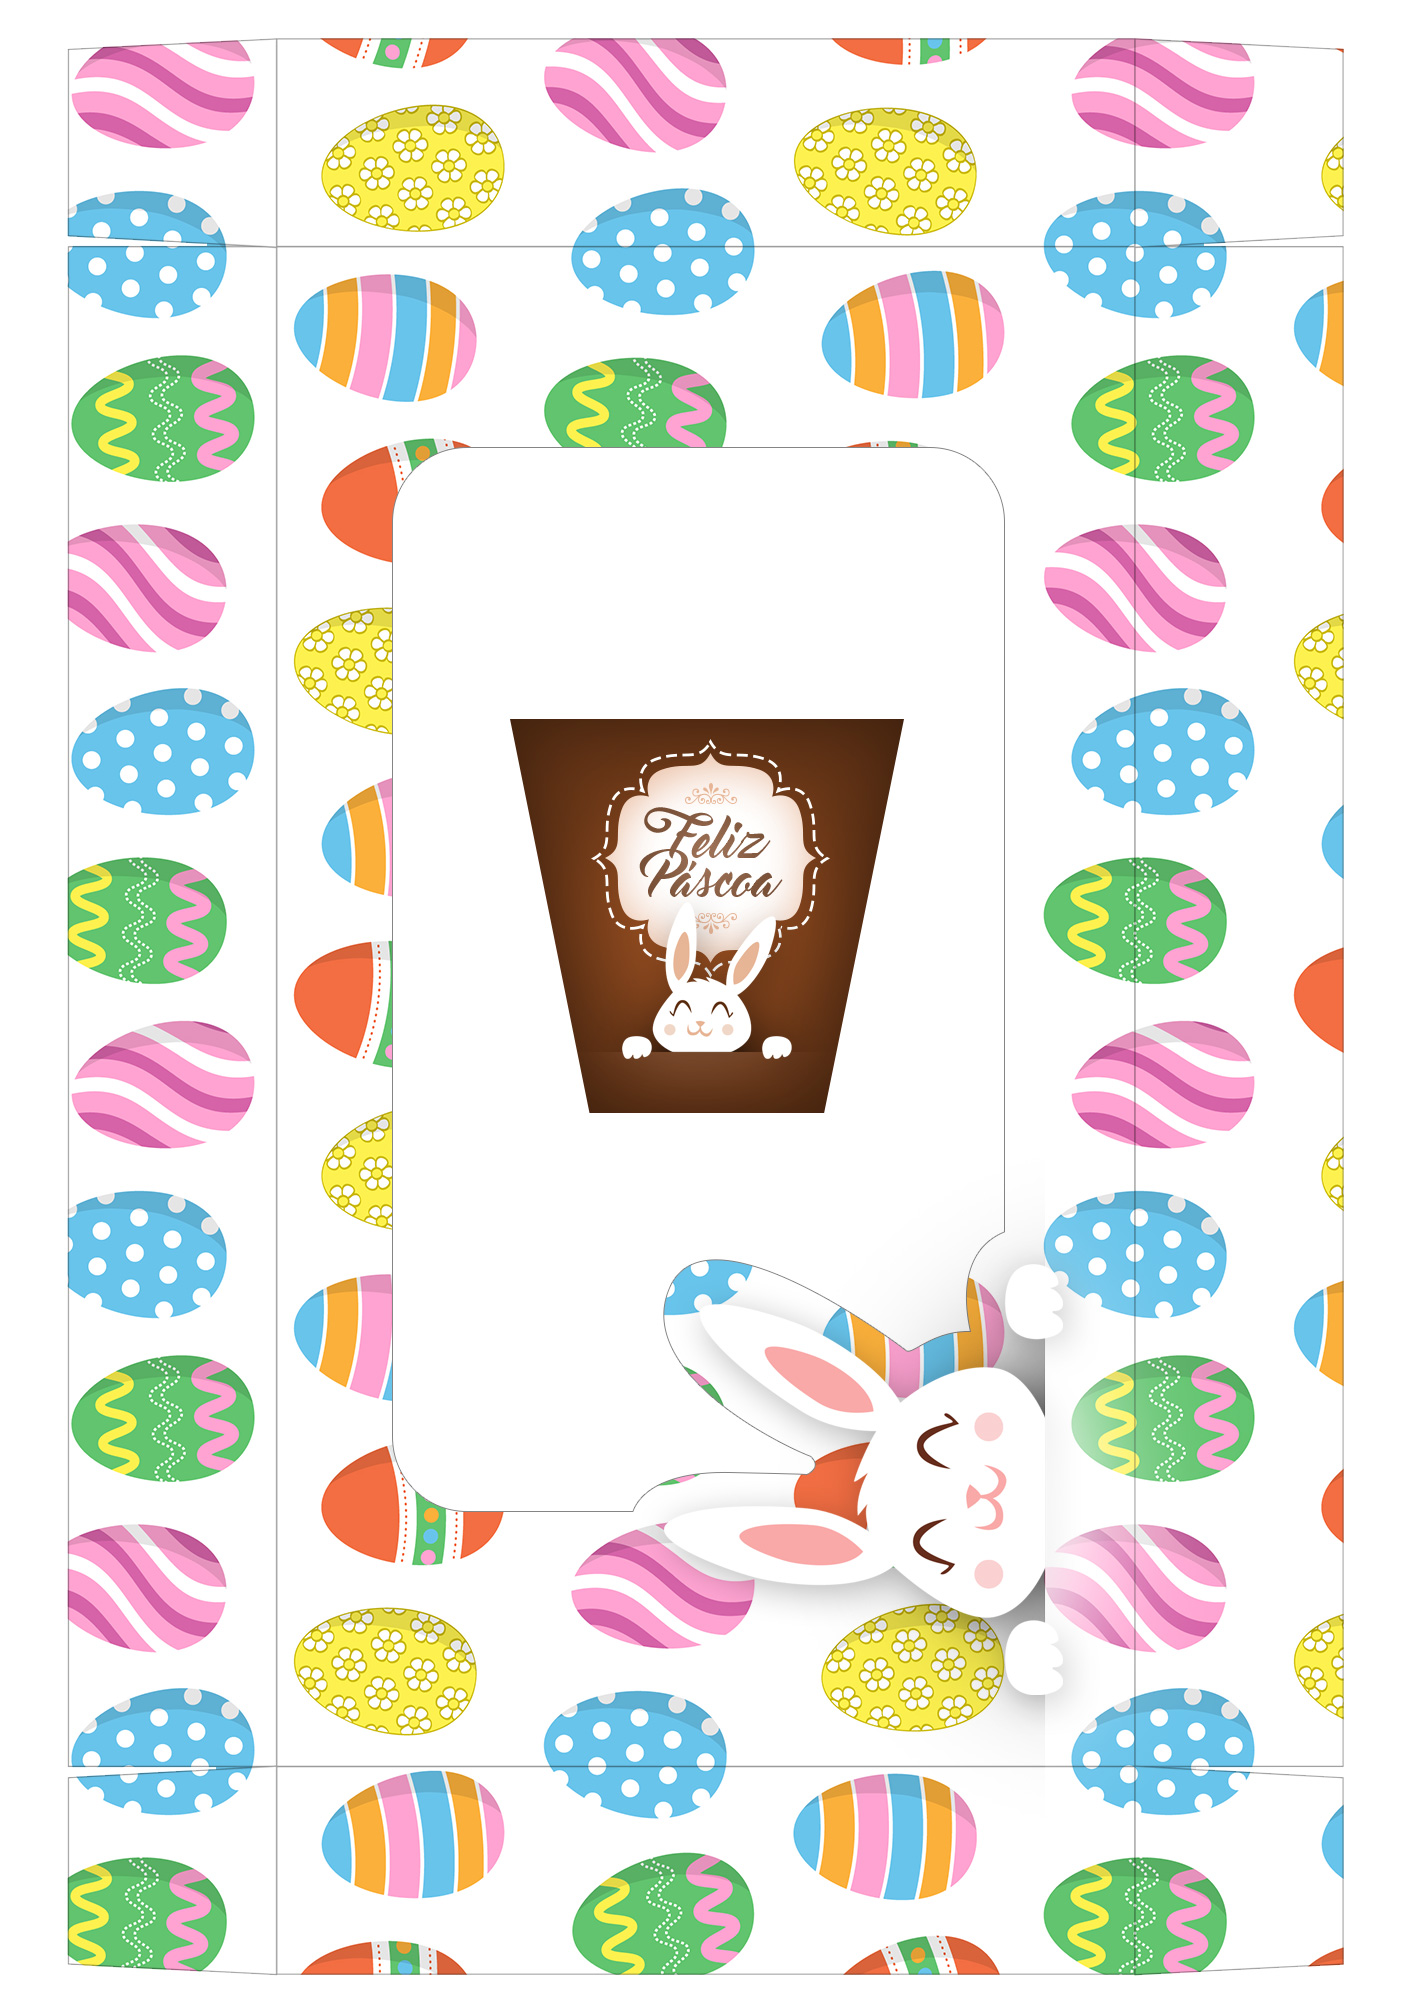 Caixa Kit Mini Confeiteiro para Páscoa 16 - parte de cima